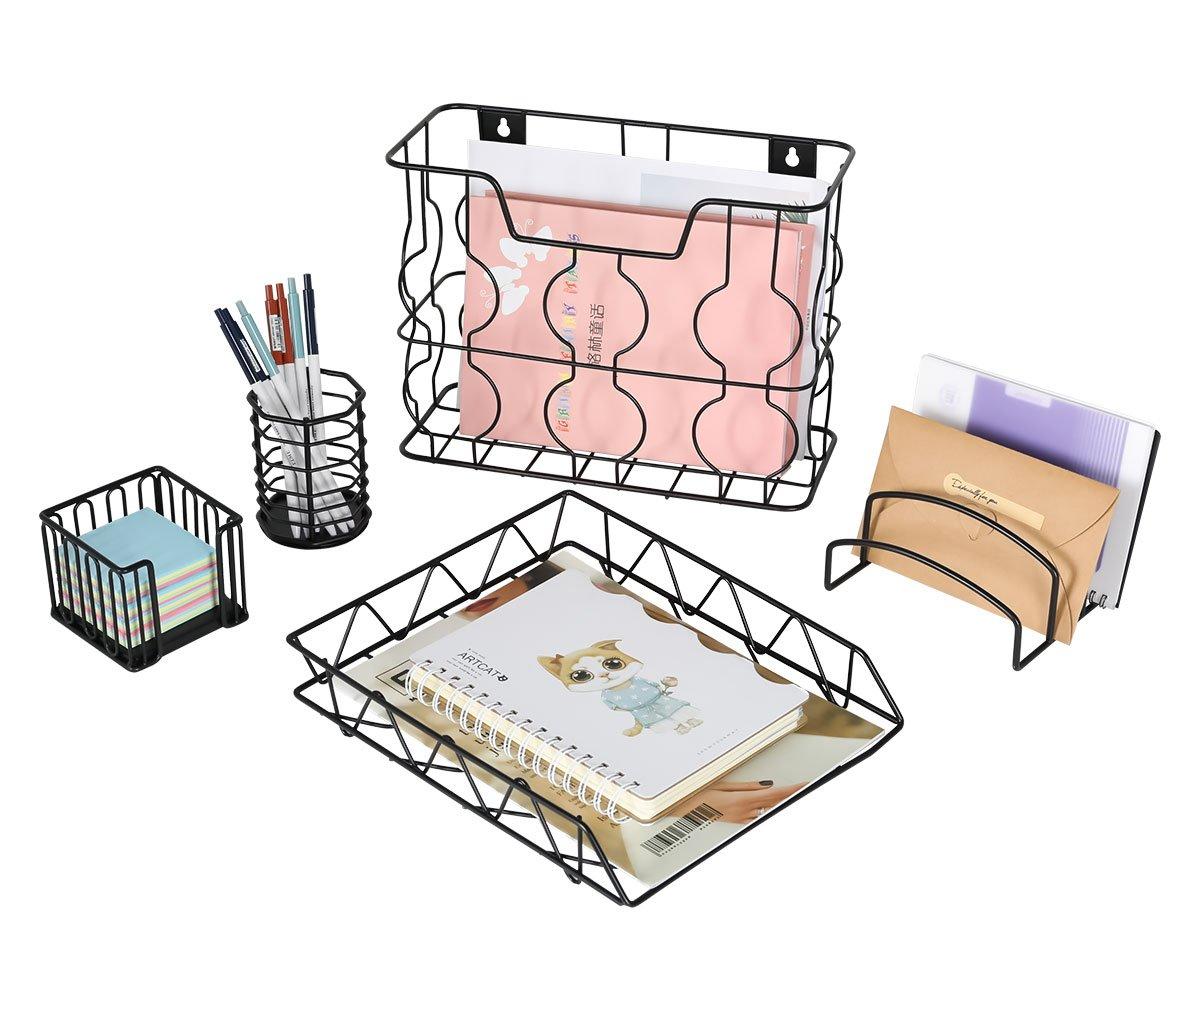 Swell Amazon Com Pag Office Supplies 5 In 1 Metal Desk Organizer Beutiful Home Inspiration Xortanetmahrainfo